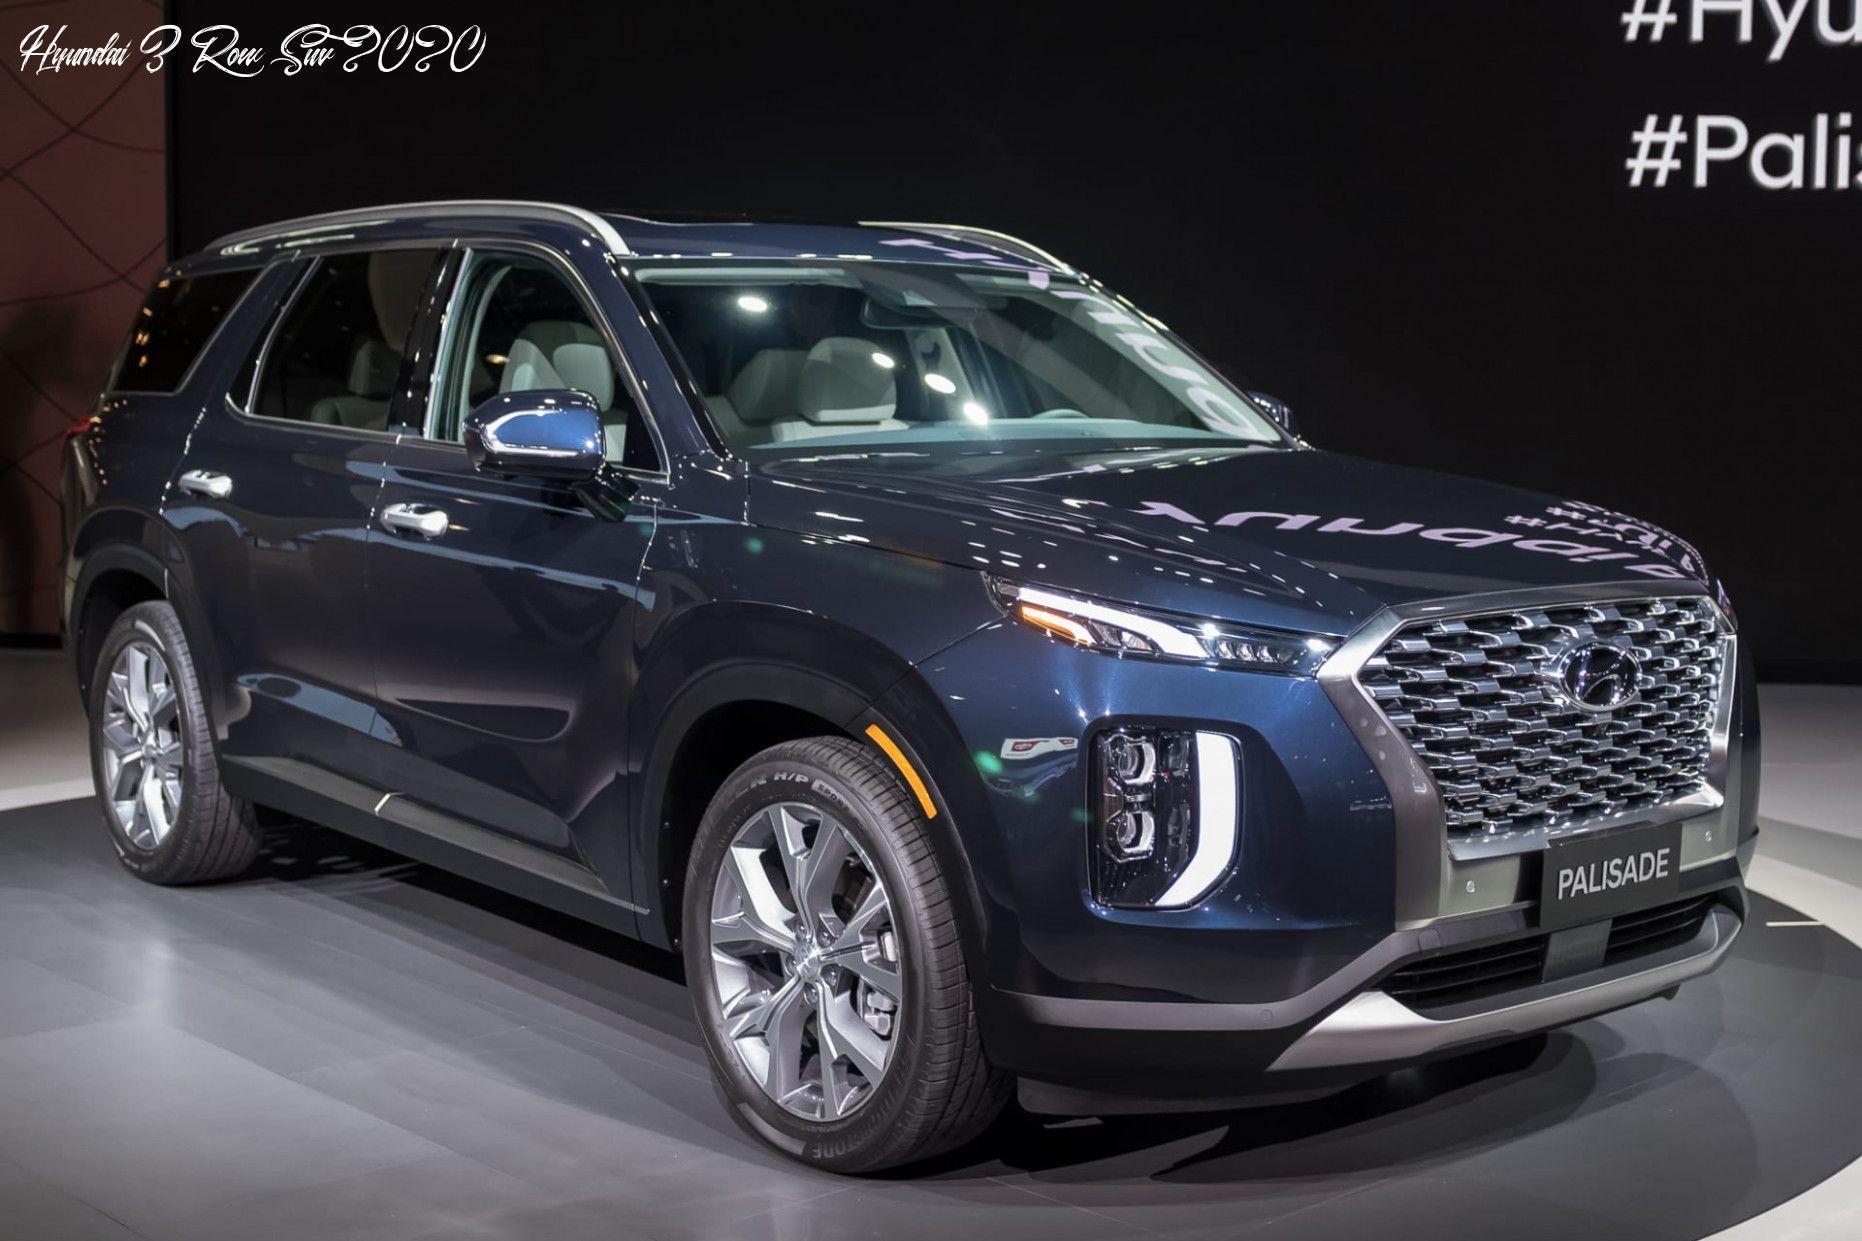 Hyundai 3 Row Suv 2020 Overview In 2020 Hyundai Cars New Hyundai Hyundai Suv